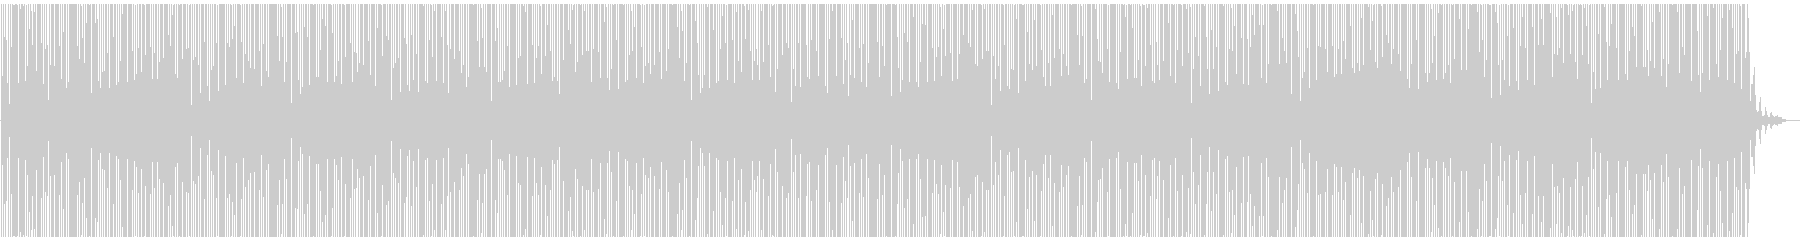 deepEcho dubMinimalの未再生の波形